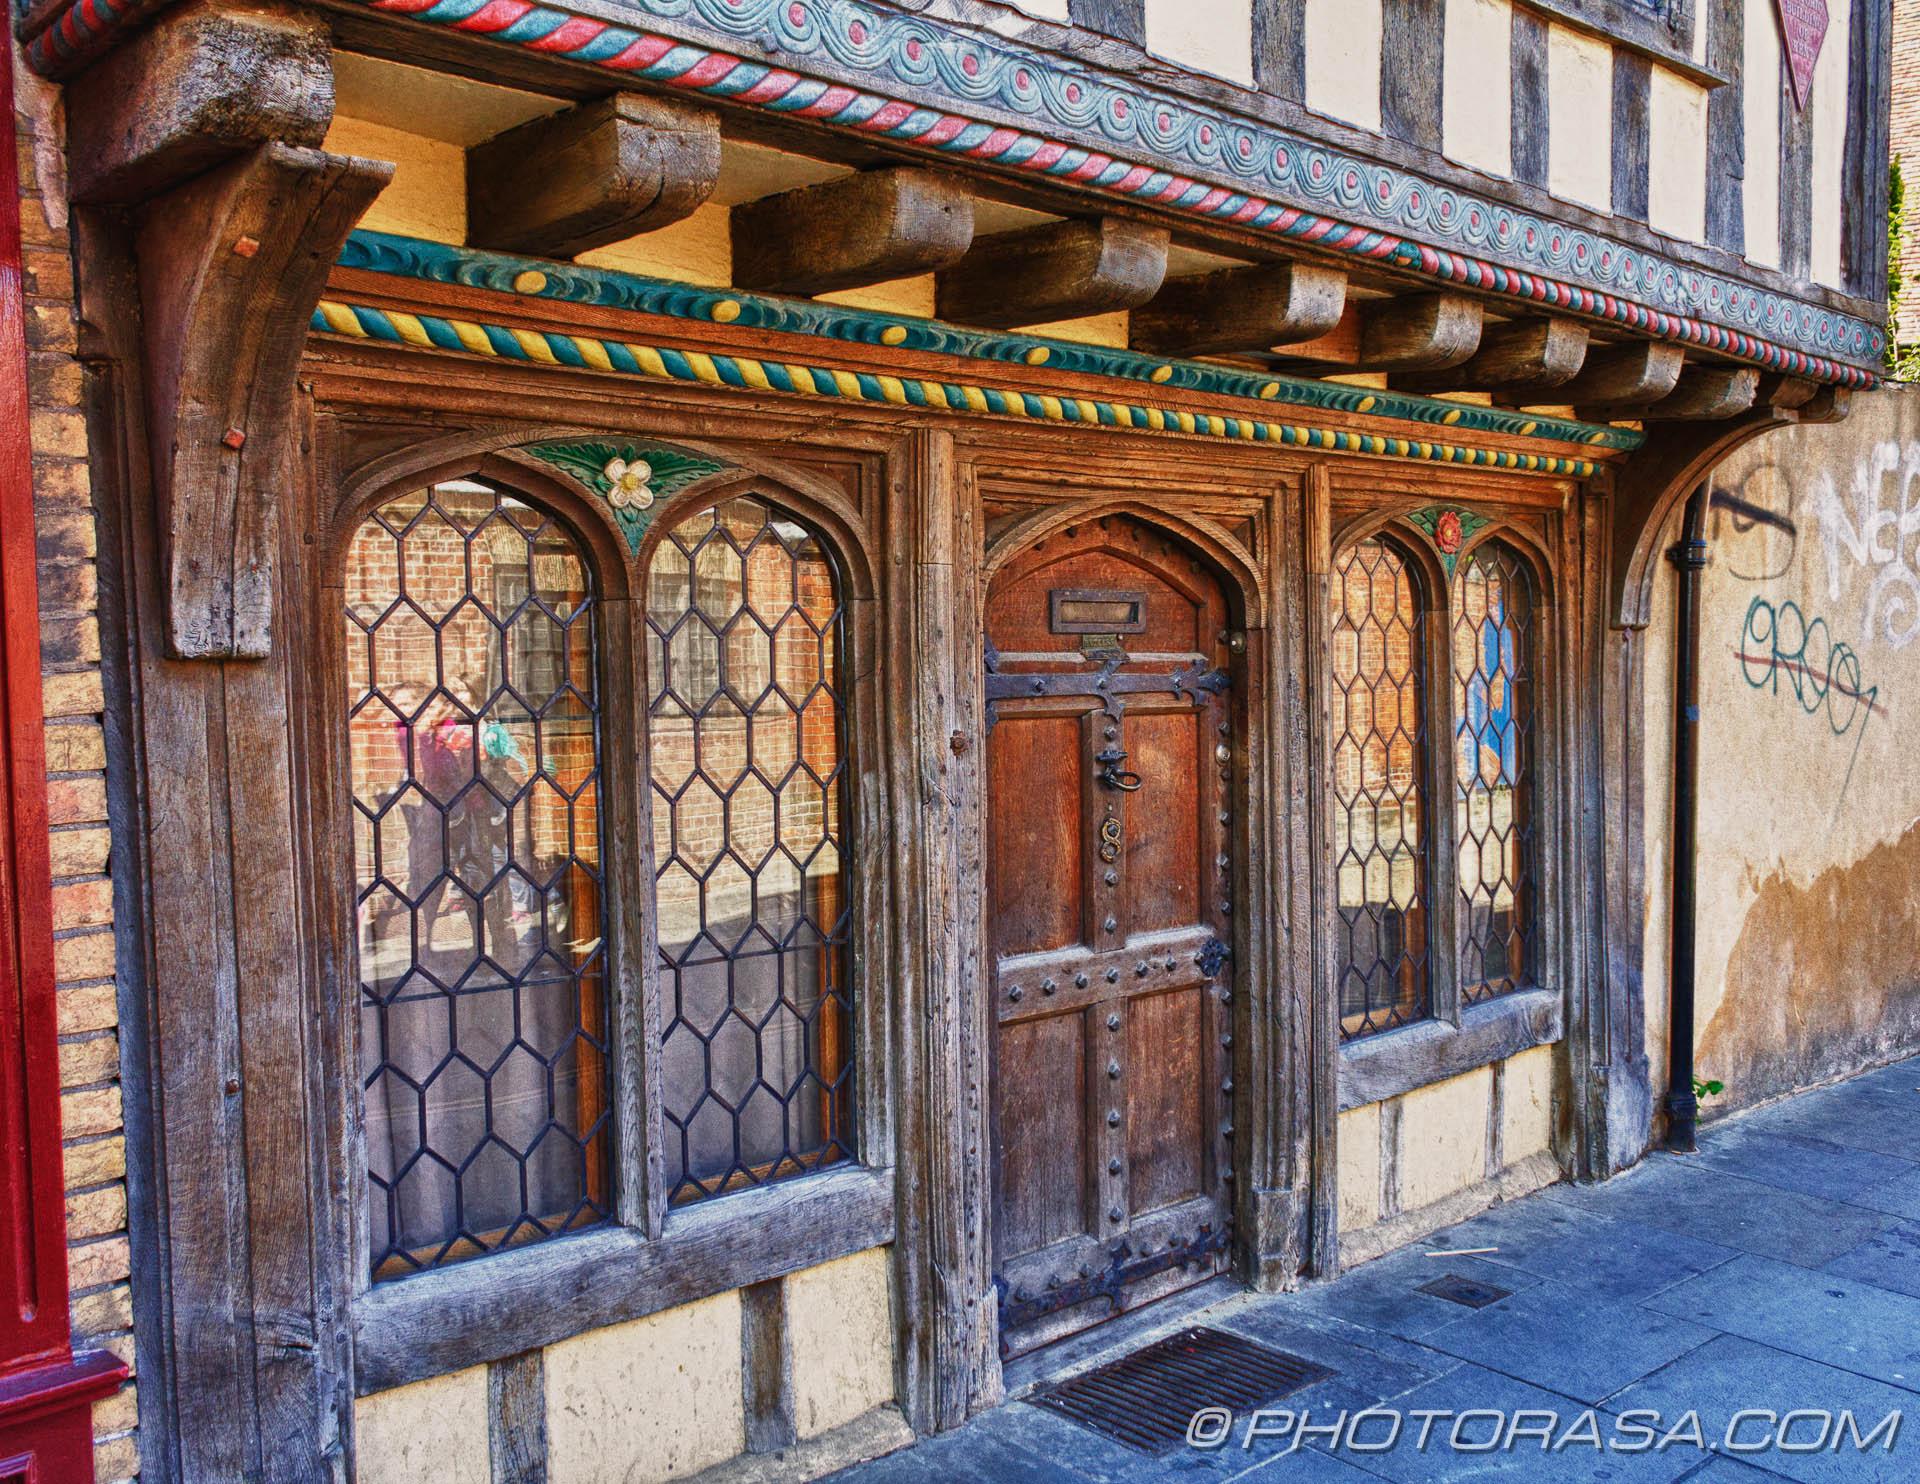 Old Decorative Shop Front Photorasa Free Hd Photos